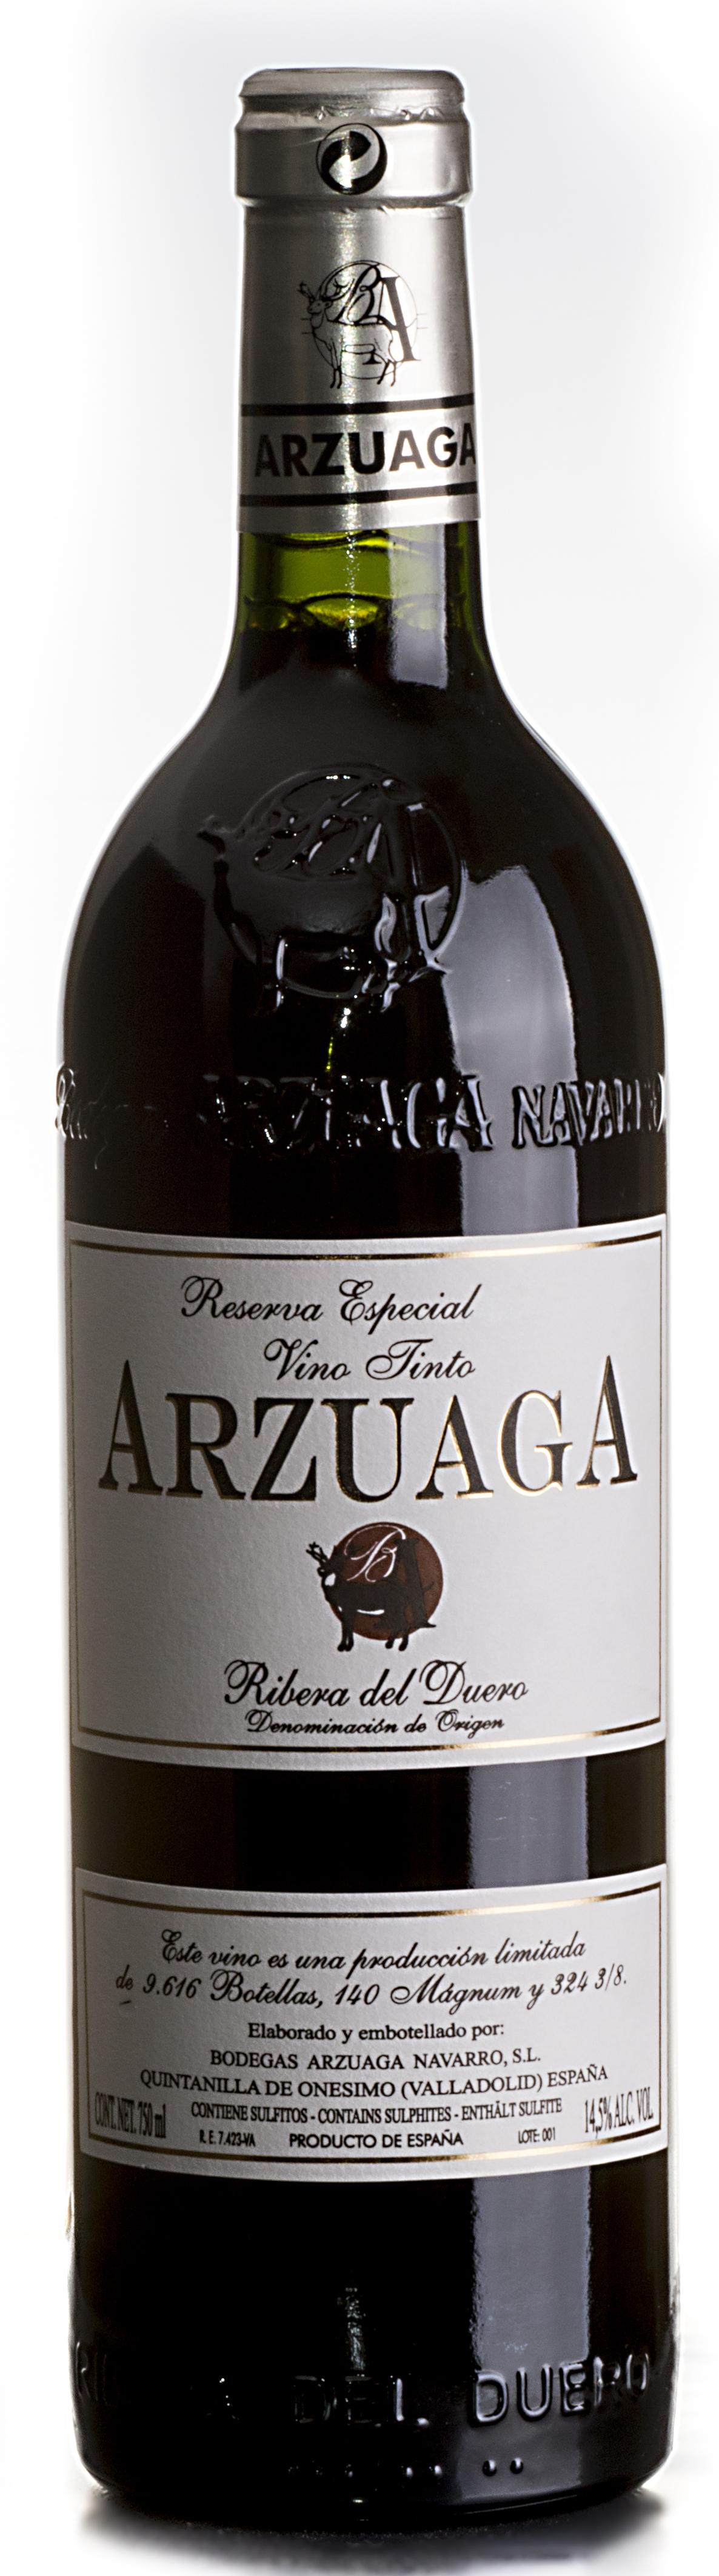 Reserva Especial   Arzuaga - Winexfood